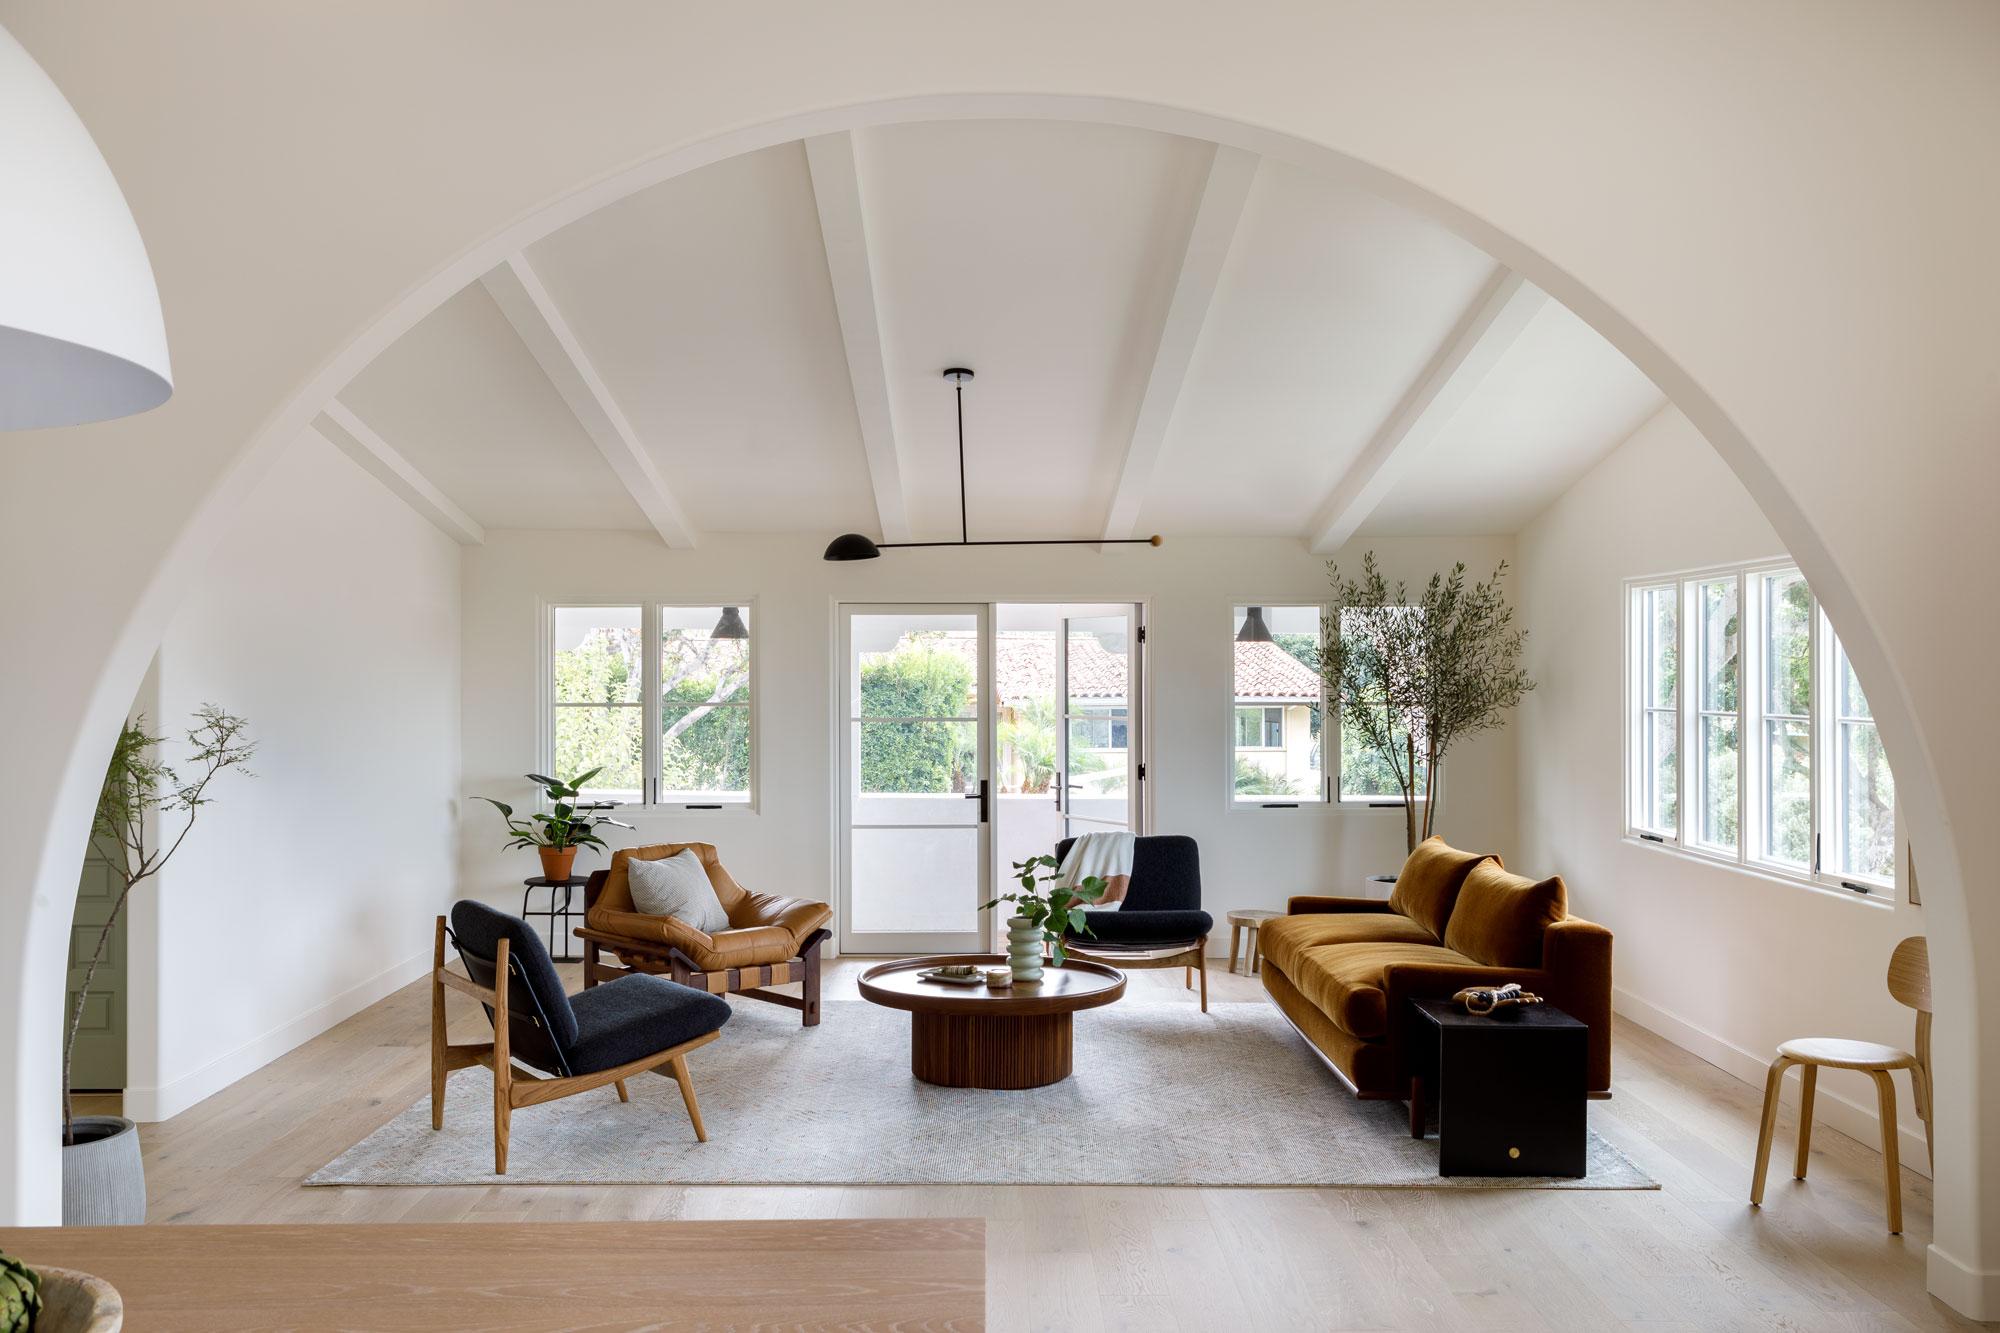 La Fortuna Residence La Home Beatriz Rose Byrdesign Photo Laure Joliet Yellowtrace 05